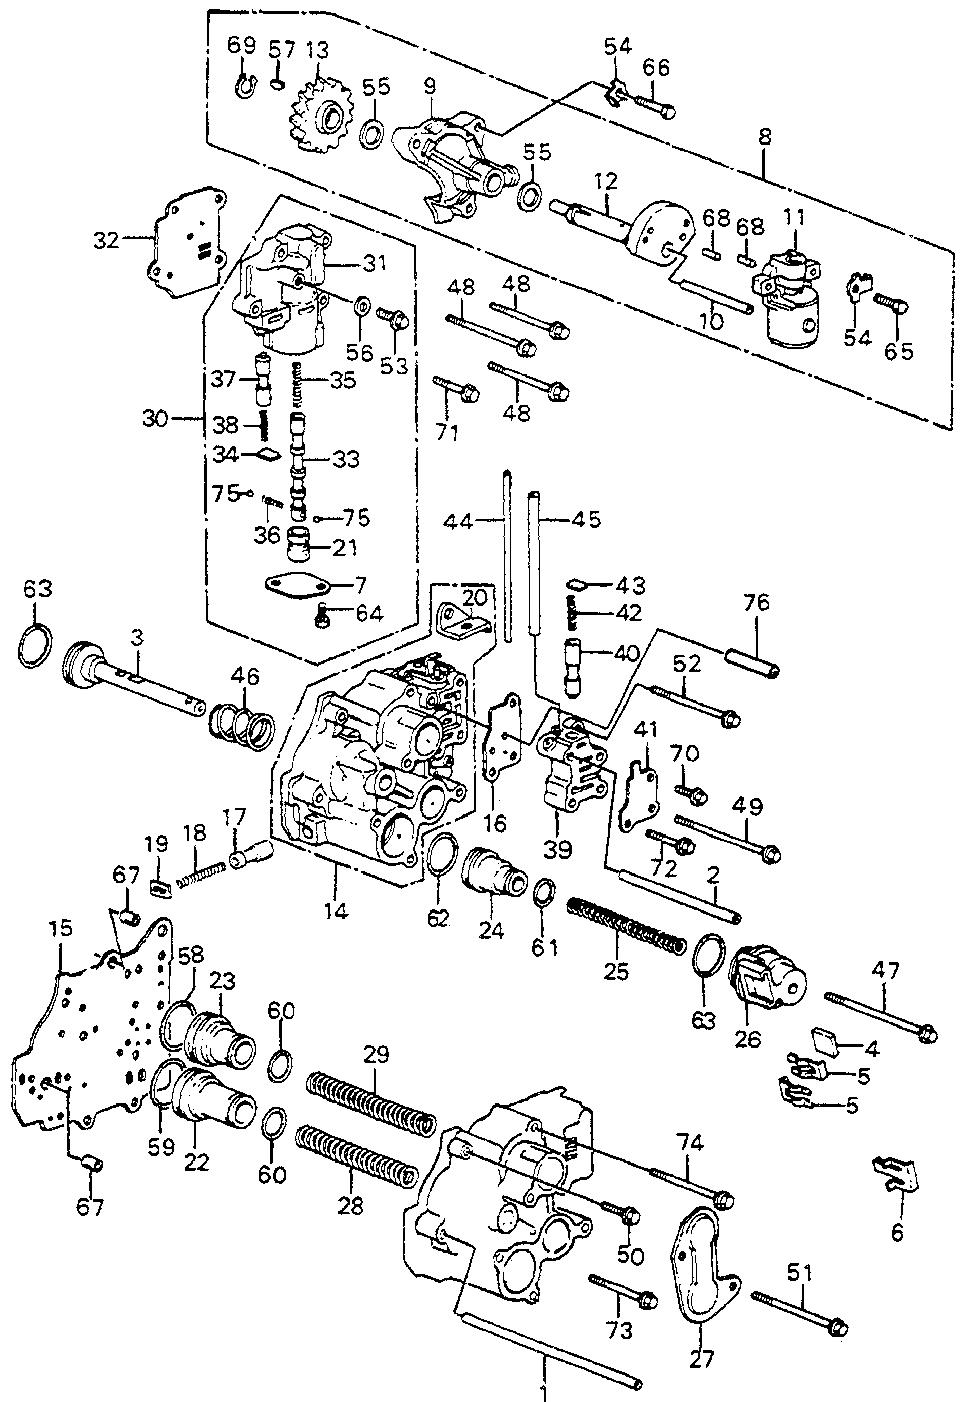 hight resolution of 27418 pc9 000 spring orifice control valve